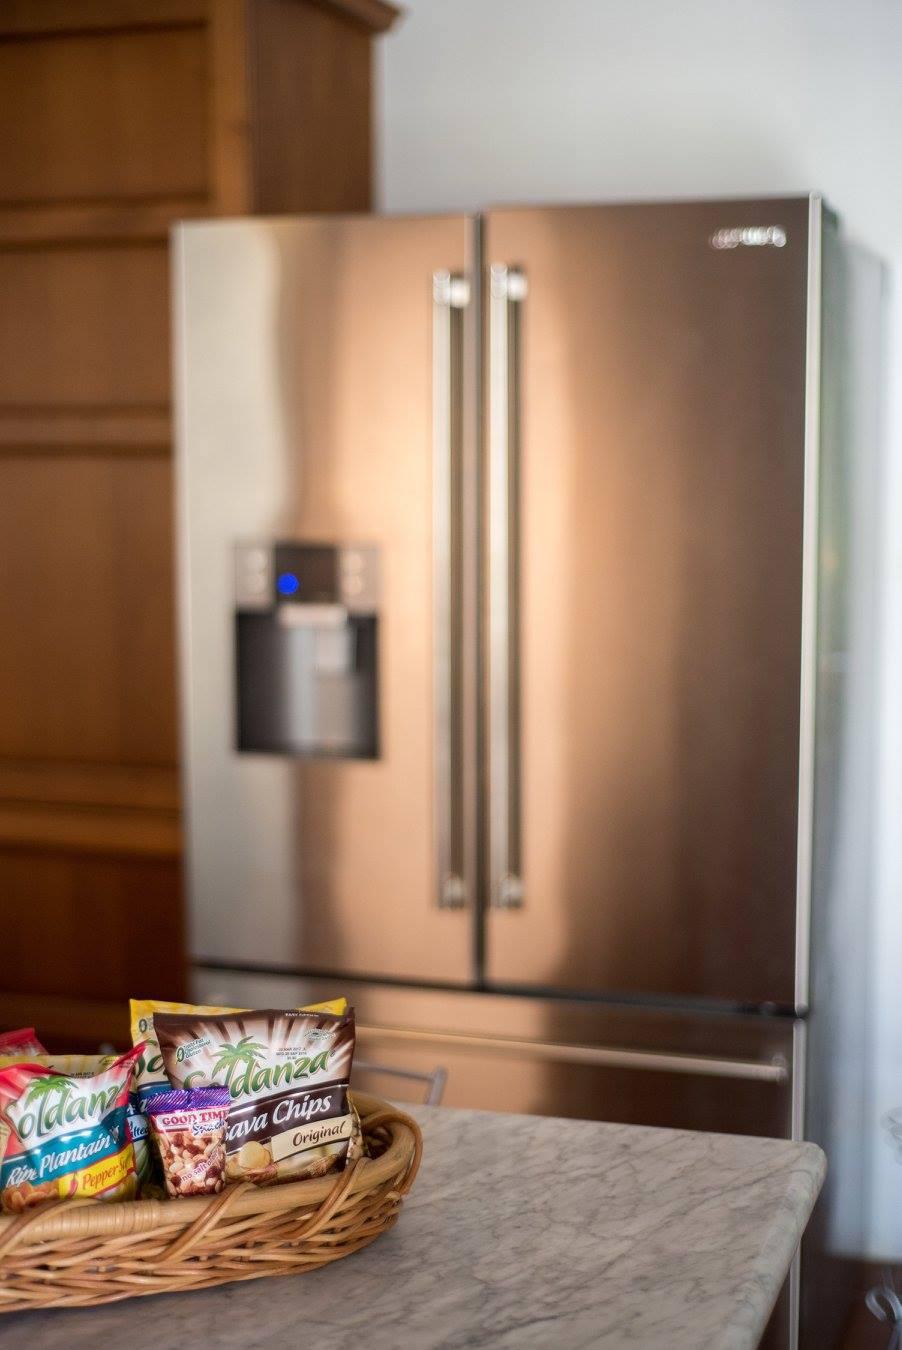 fridge door inside a villa to rent in Barbados